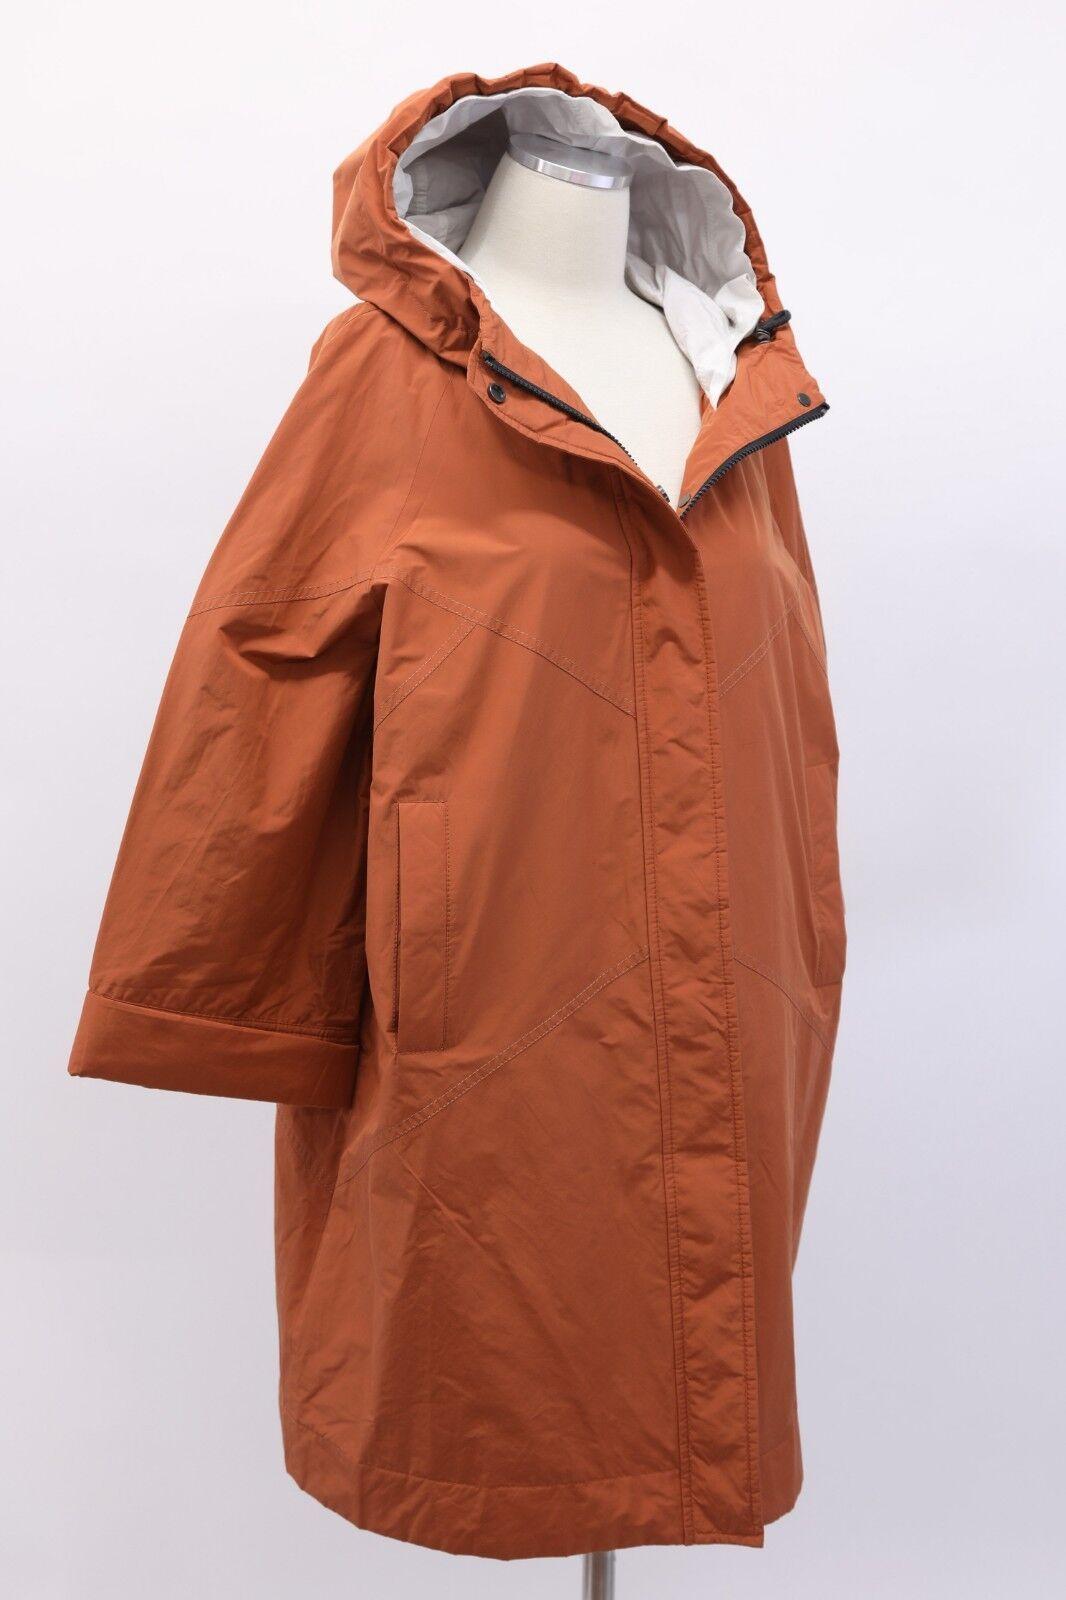 NWT 3195 Brunello Cucinelli Monili Bead Hooded Overcoat W Logo Details 42 M A186